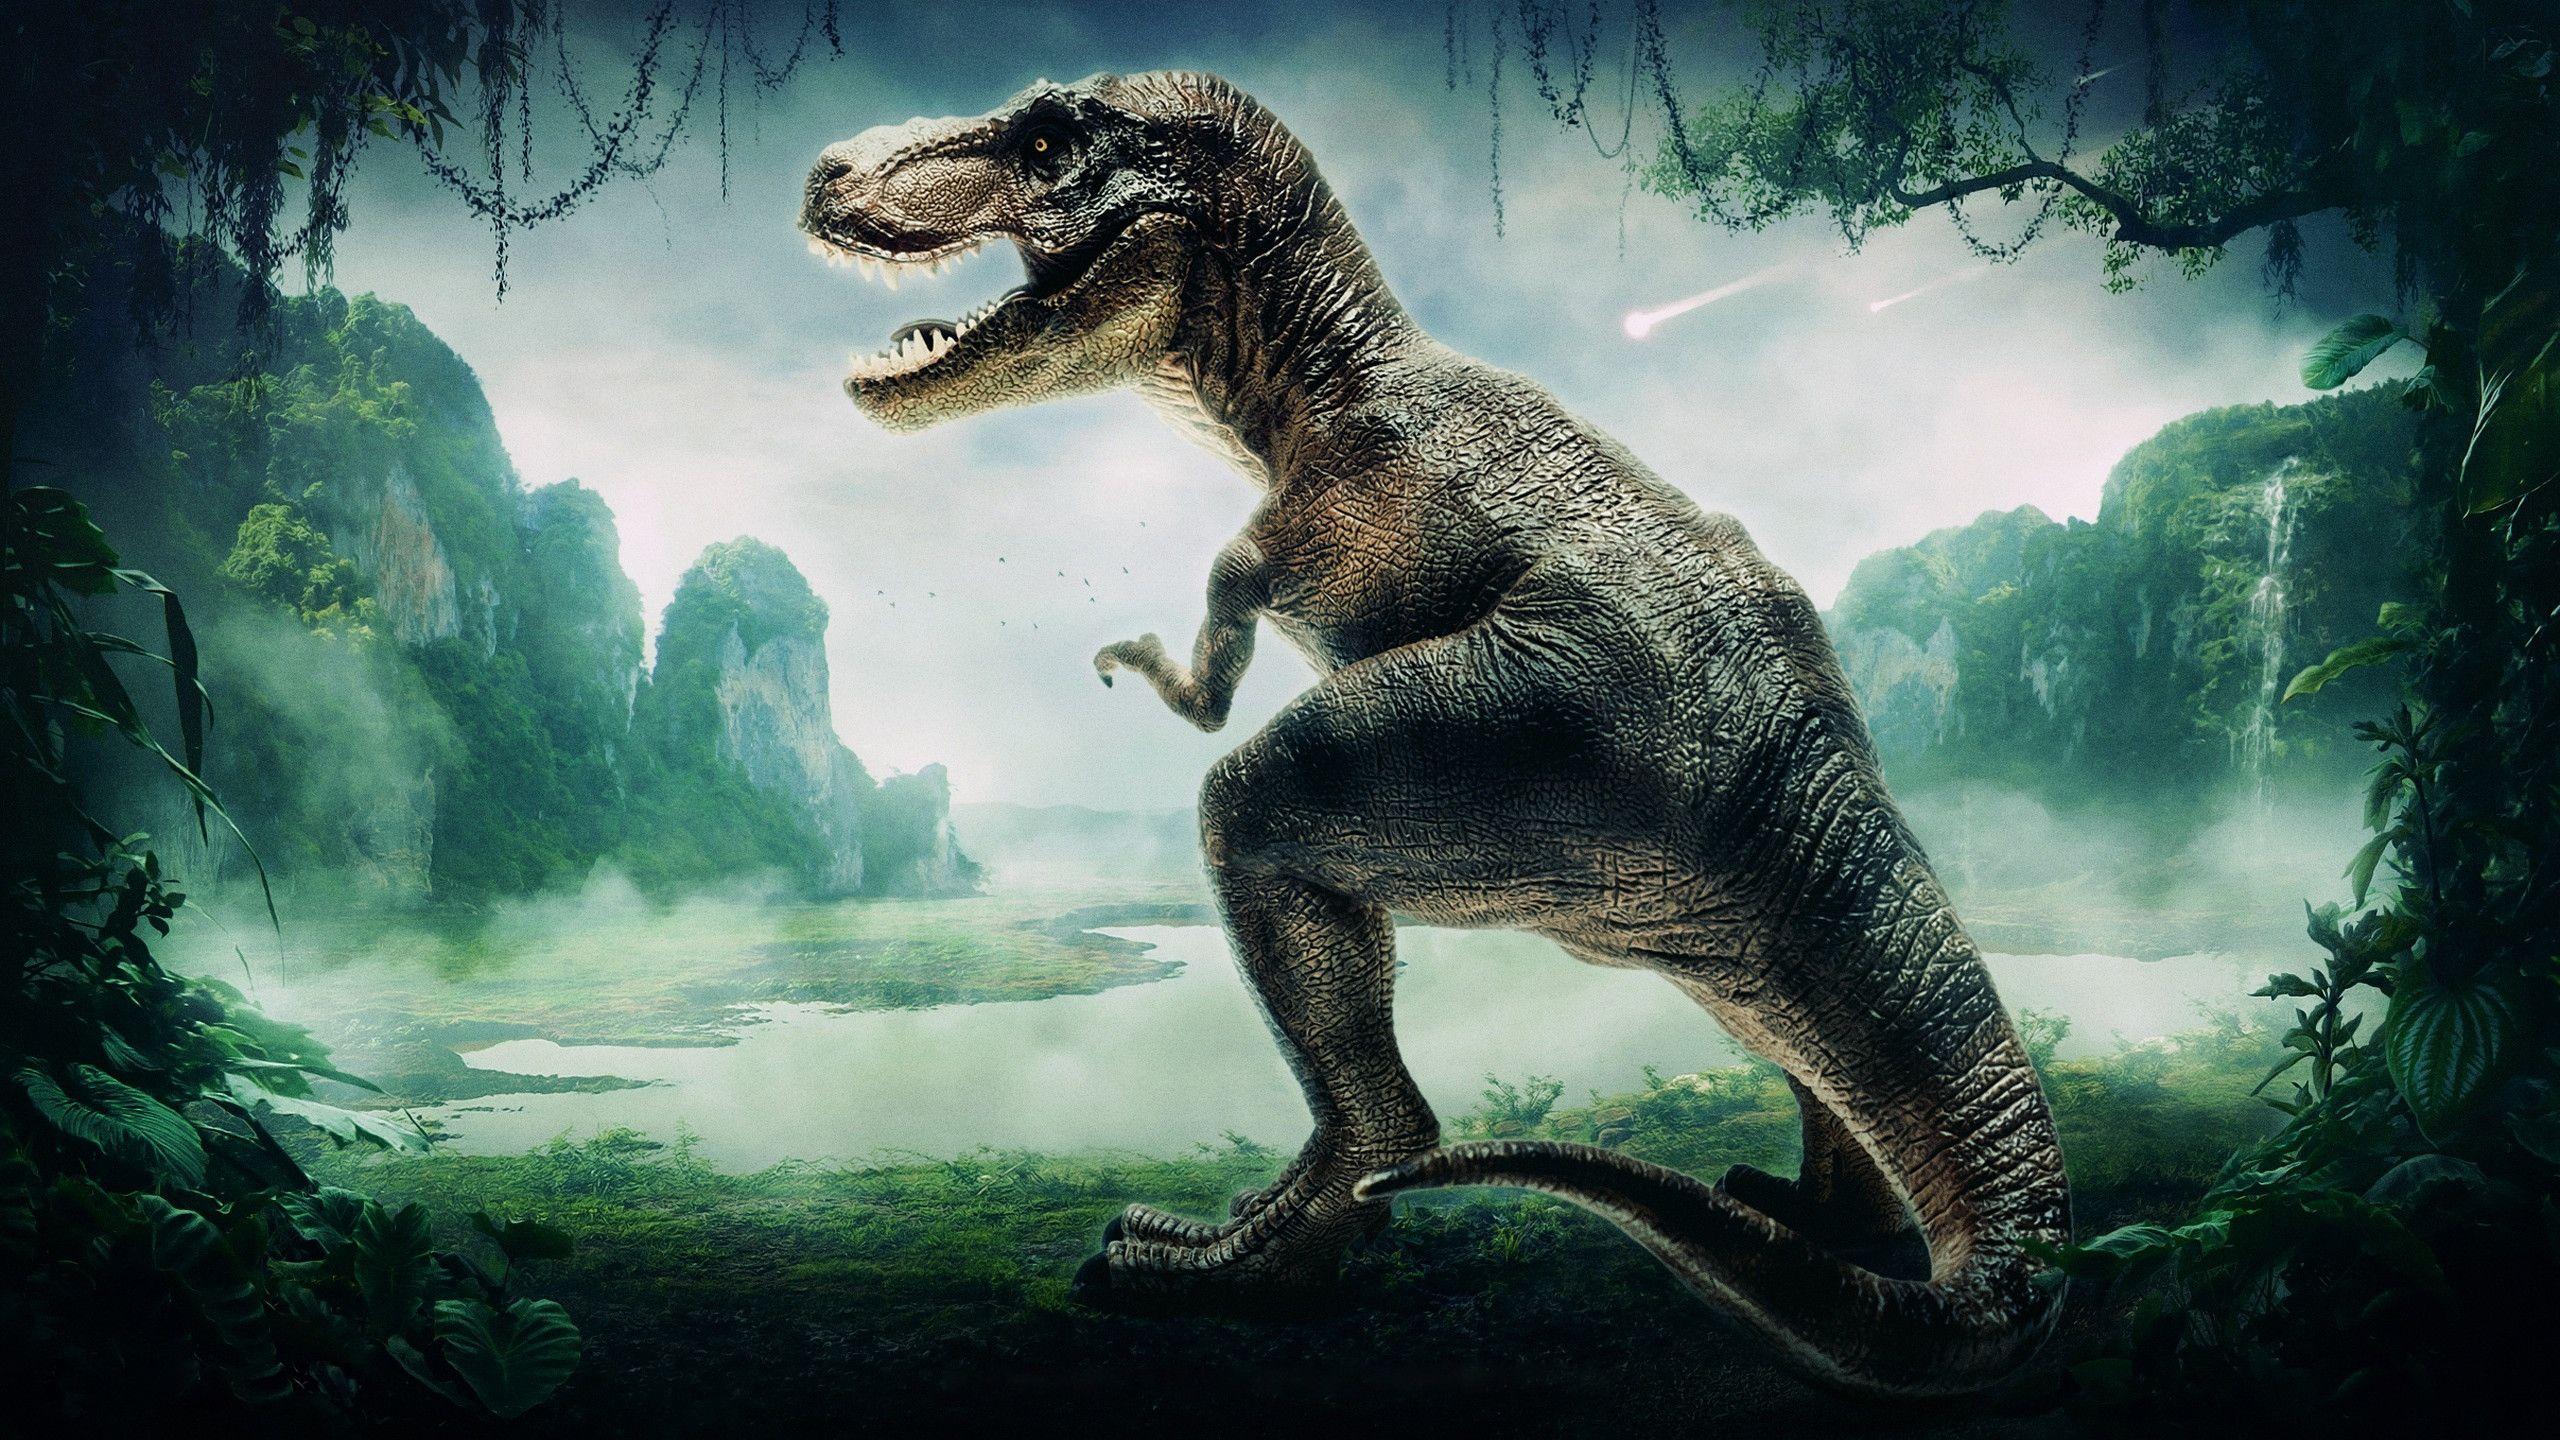 Dinosaur Wallpaper High Quality Resolution Dinosaur Background Dinosaur Wallpaper Animals